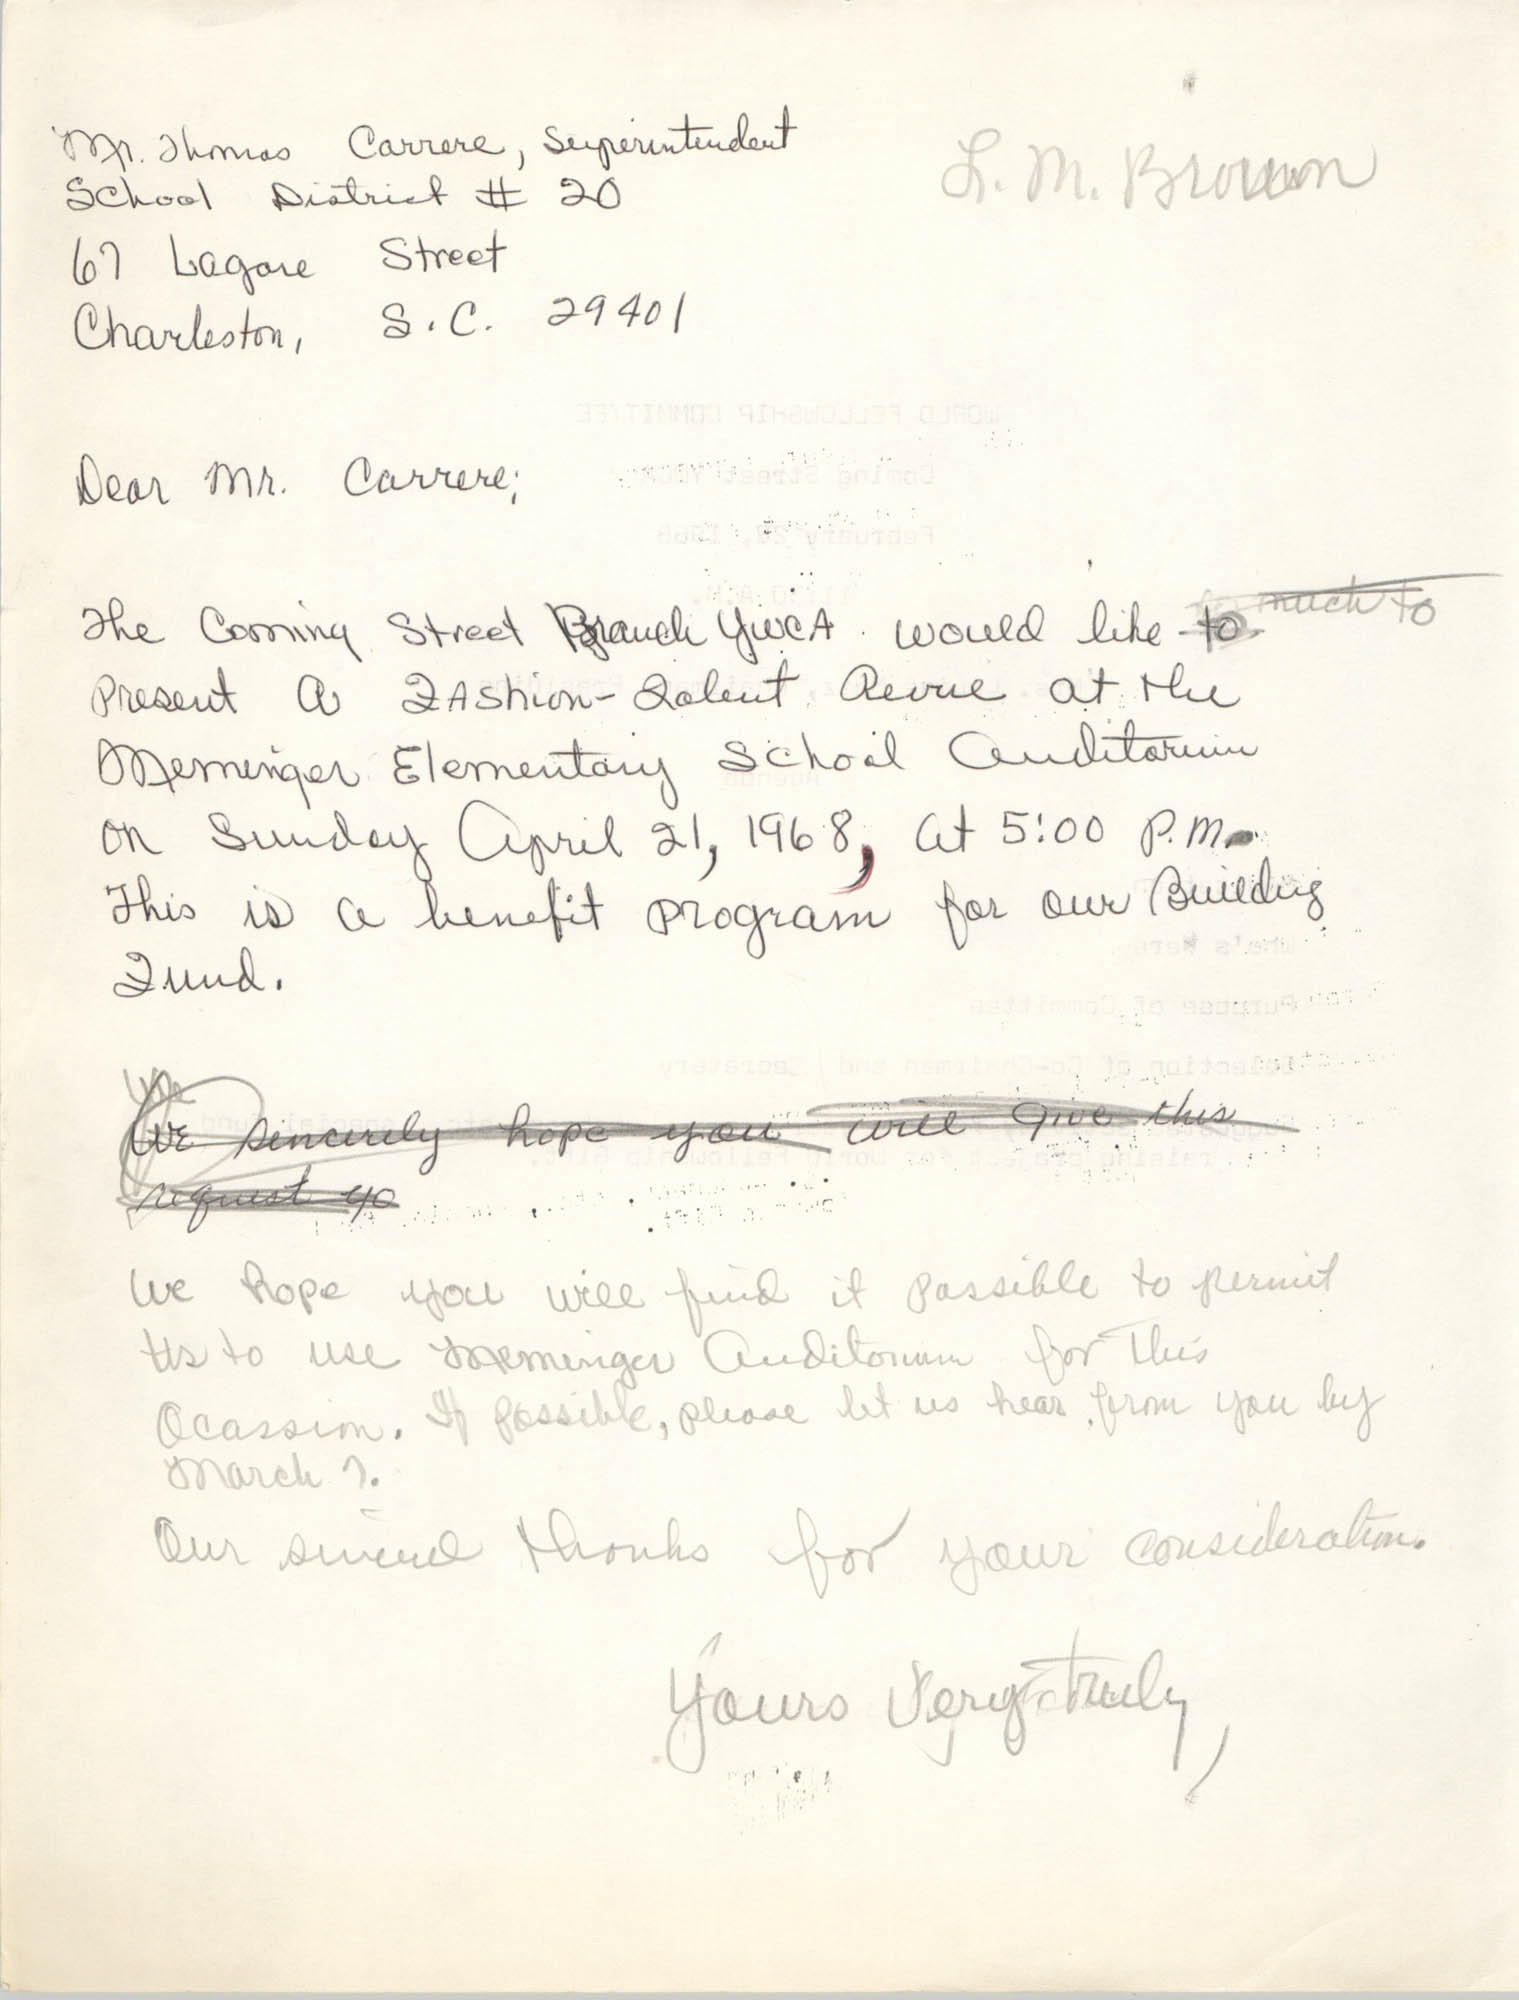 Letter to Thomas Carrere, April 1968